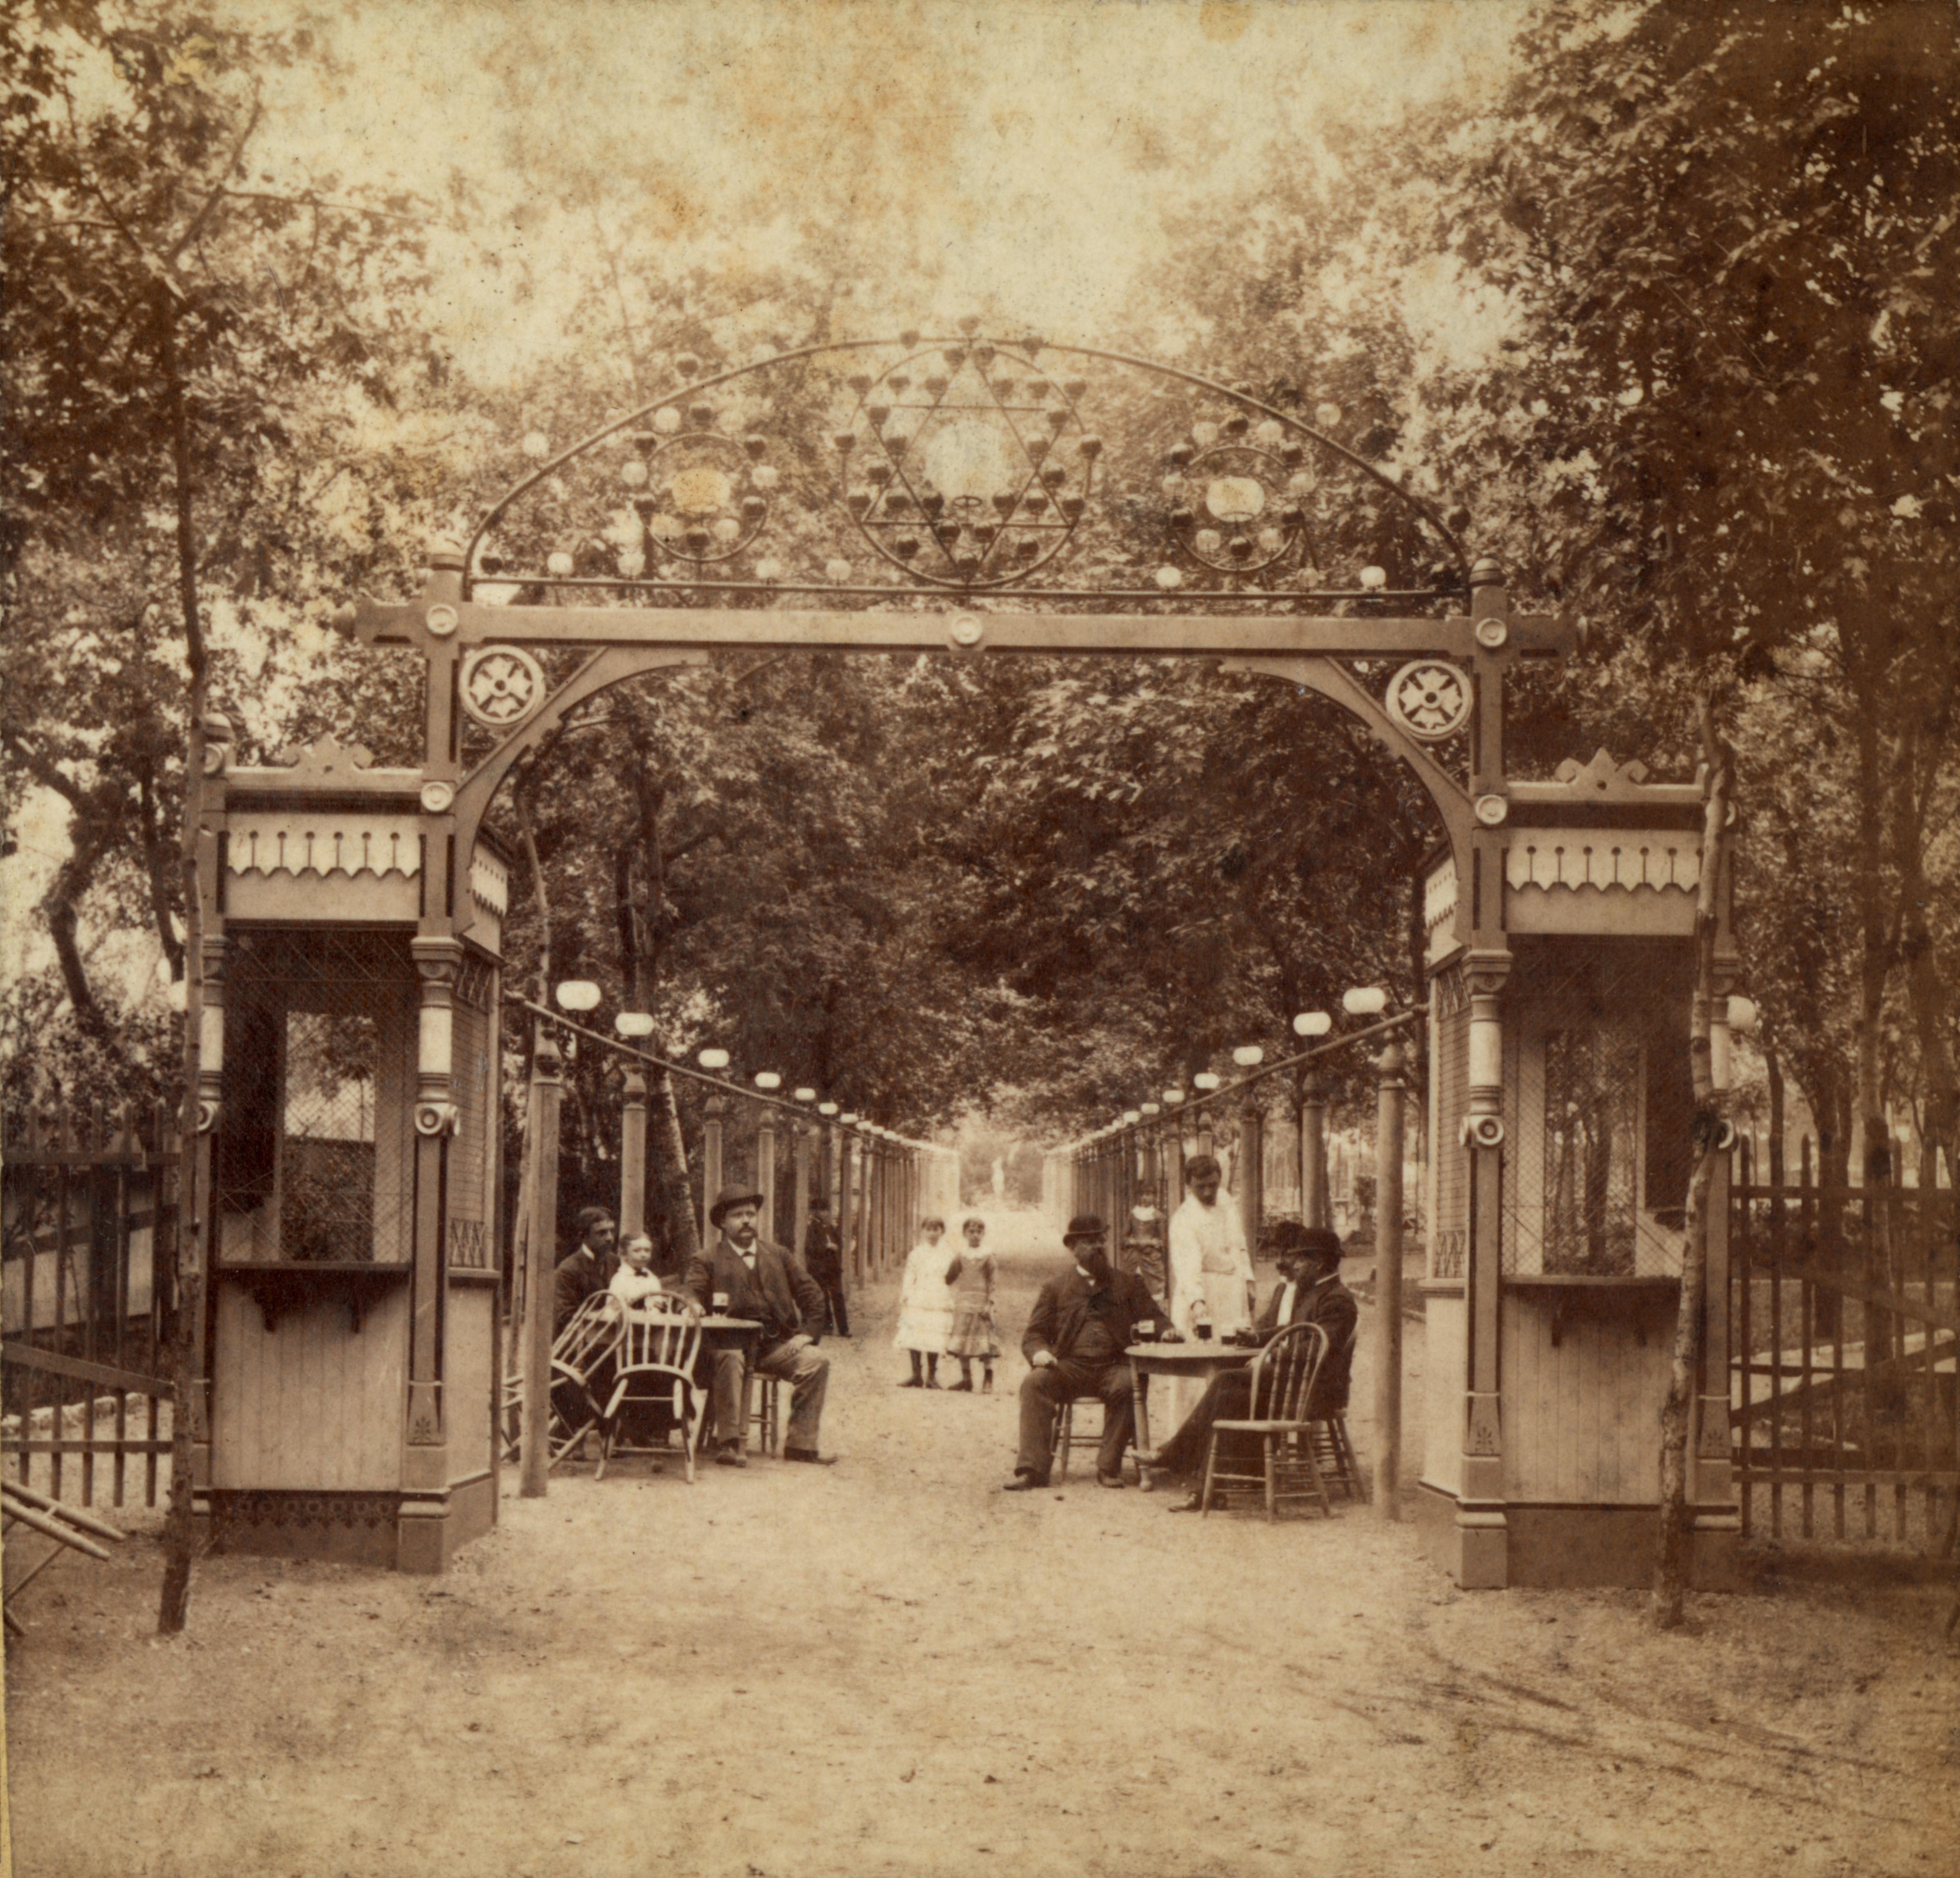 File:Entrance gate for Schnaider's Beer Garden  2000 Chouteau Avenue